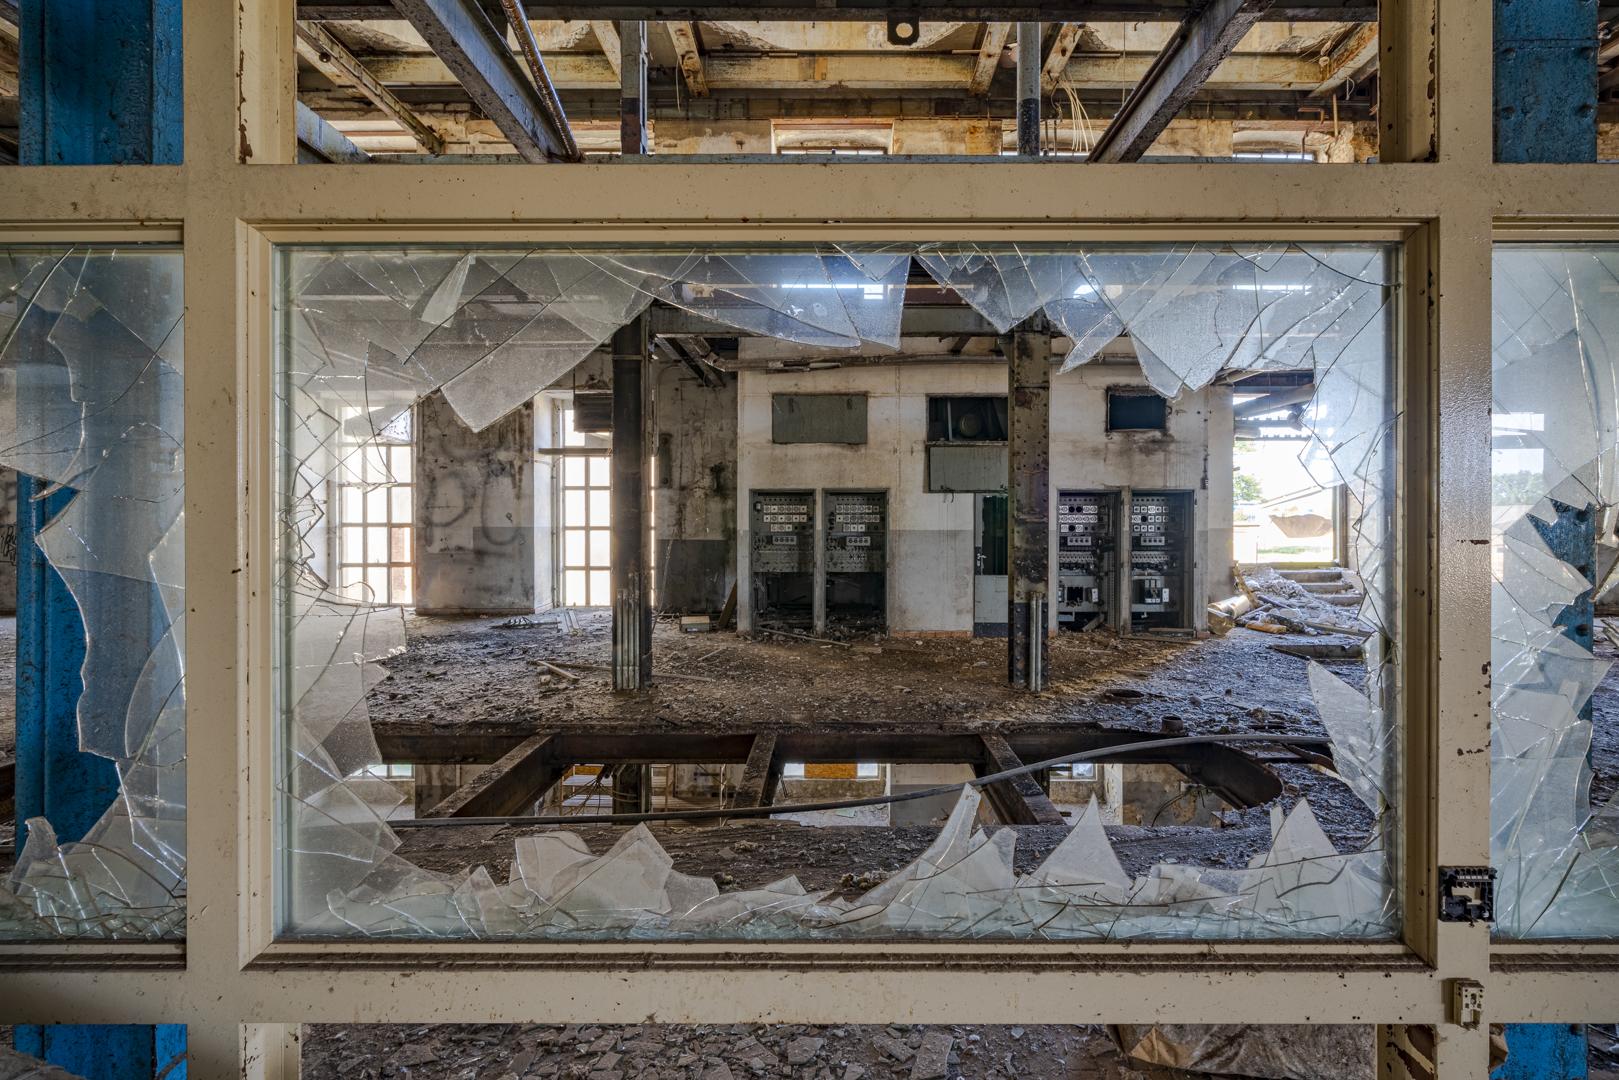 Lost Places Fotografie Fabrik Wien von Fotograf Michael Pinzolits